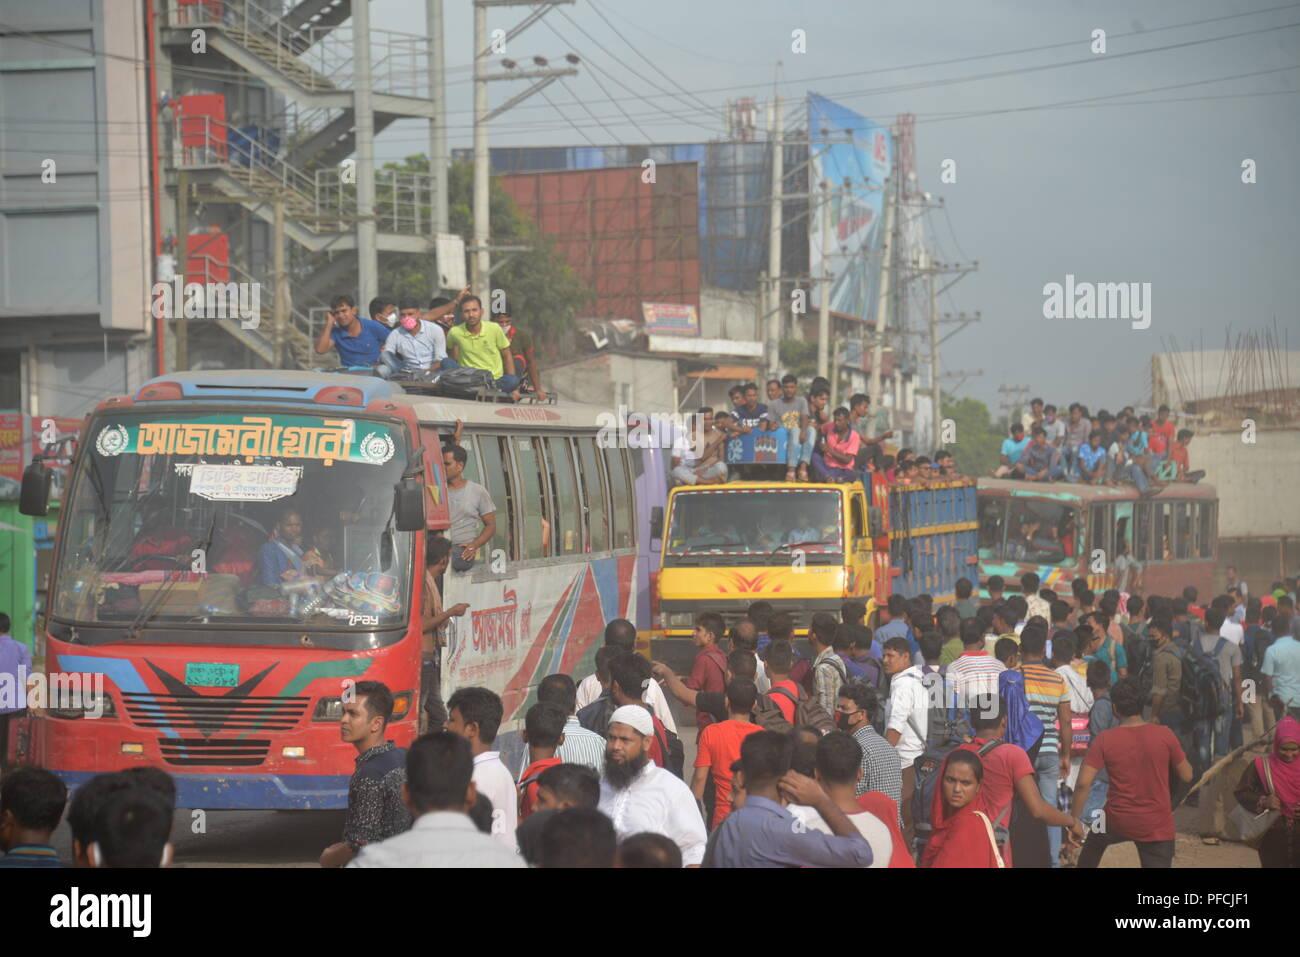 Dhaka. 21st Aug, 2018. Homebound travelers travel on buses and trucks in Dhaka, Bangladesh, on Aug. 20, 2018, during the Eid al-Adha festival. Credit: Xinhua/Alamy Live News - Stock Image